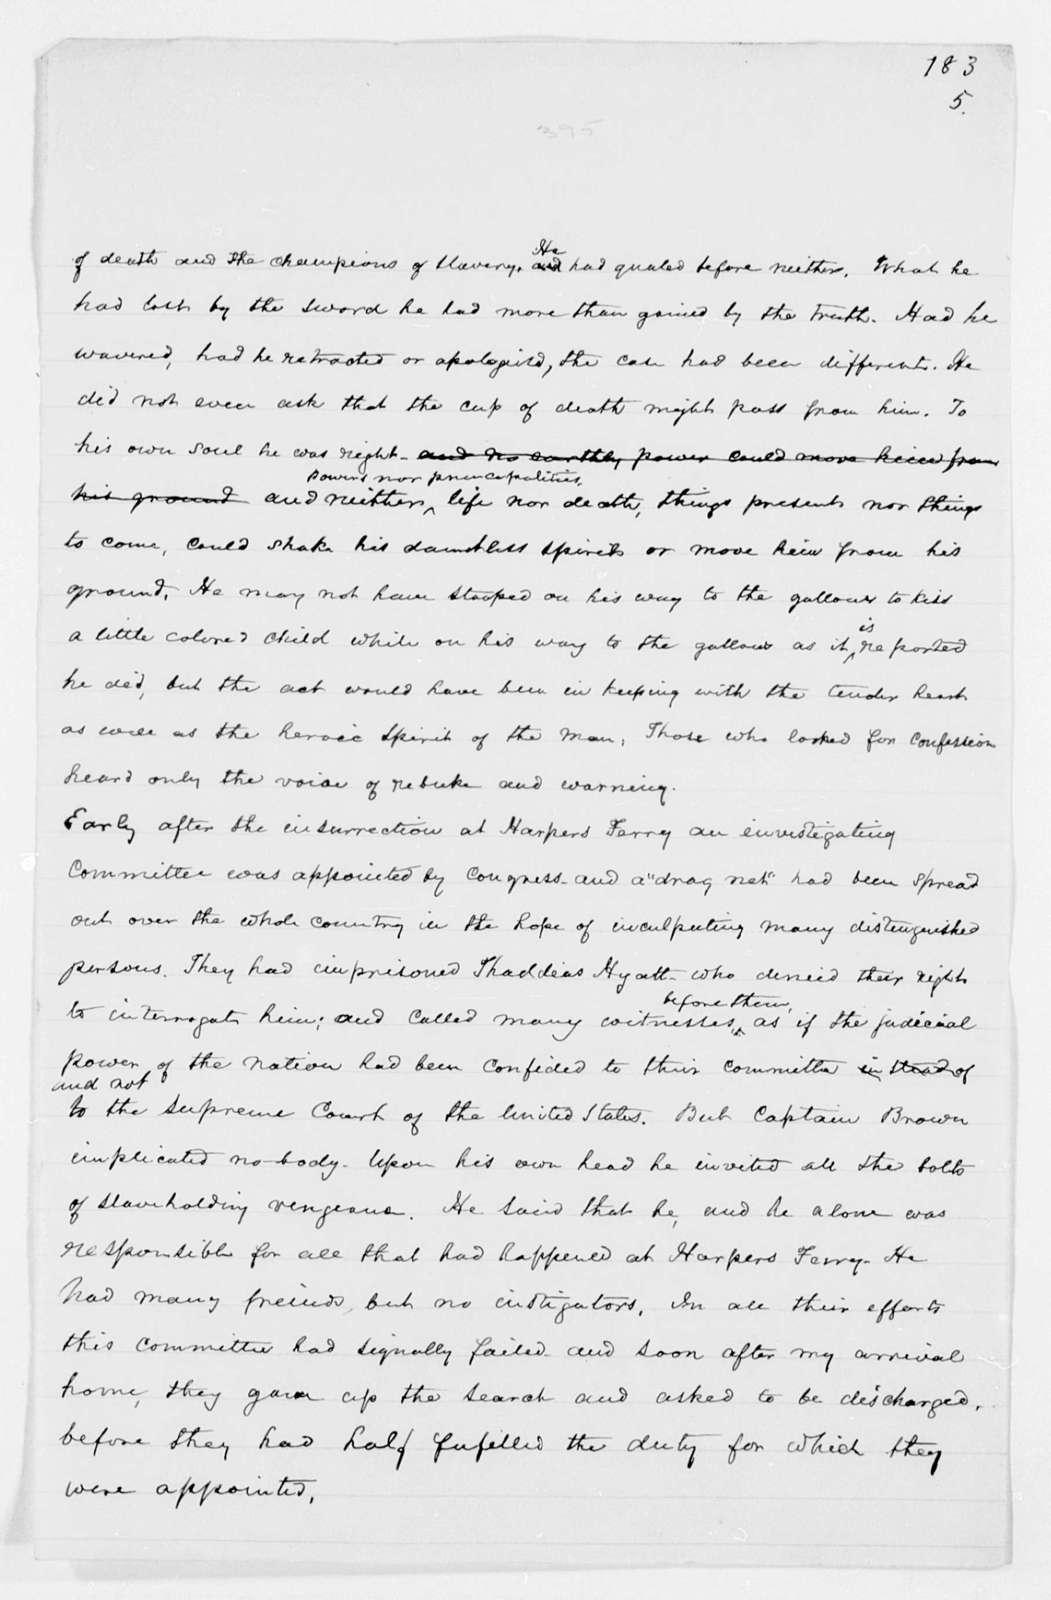 Drafts of Douglass' Autobiography - pp. 361-401